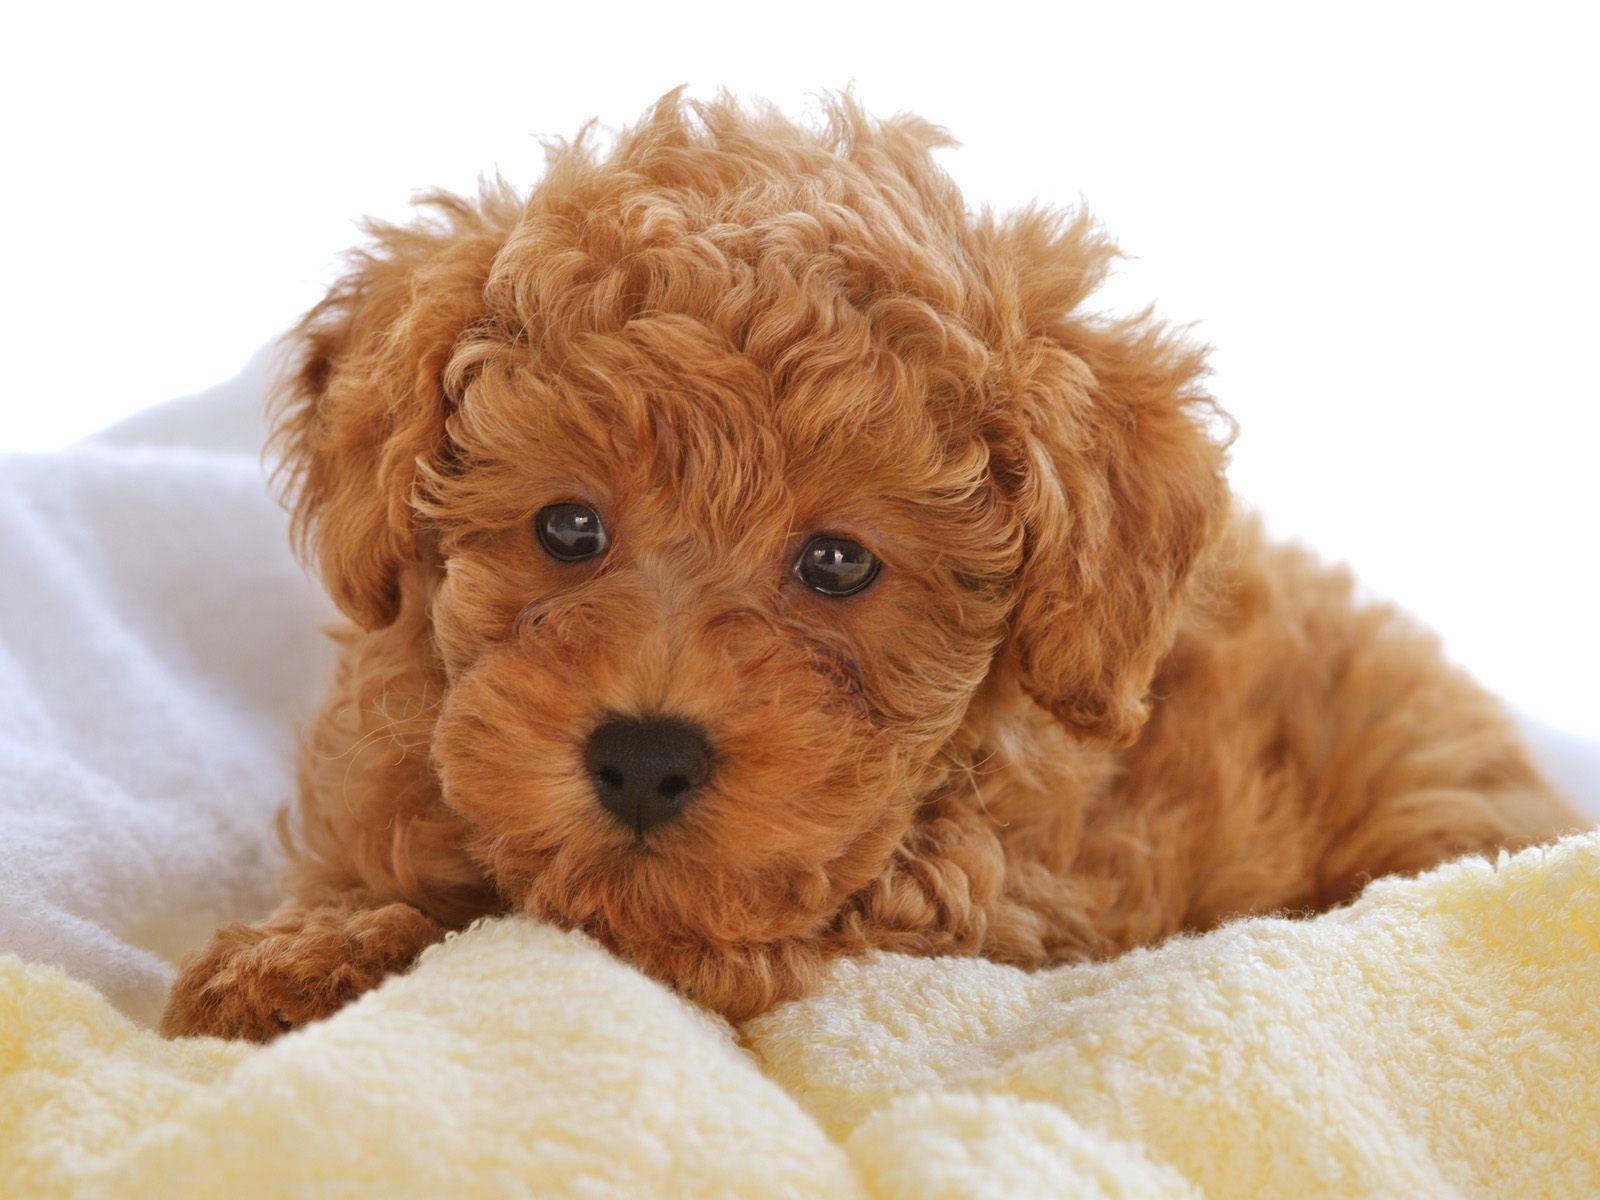 Cute Toy Poodle Niedliche Hunde Pudel Welpen Hunde Fotos